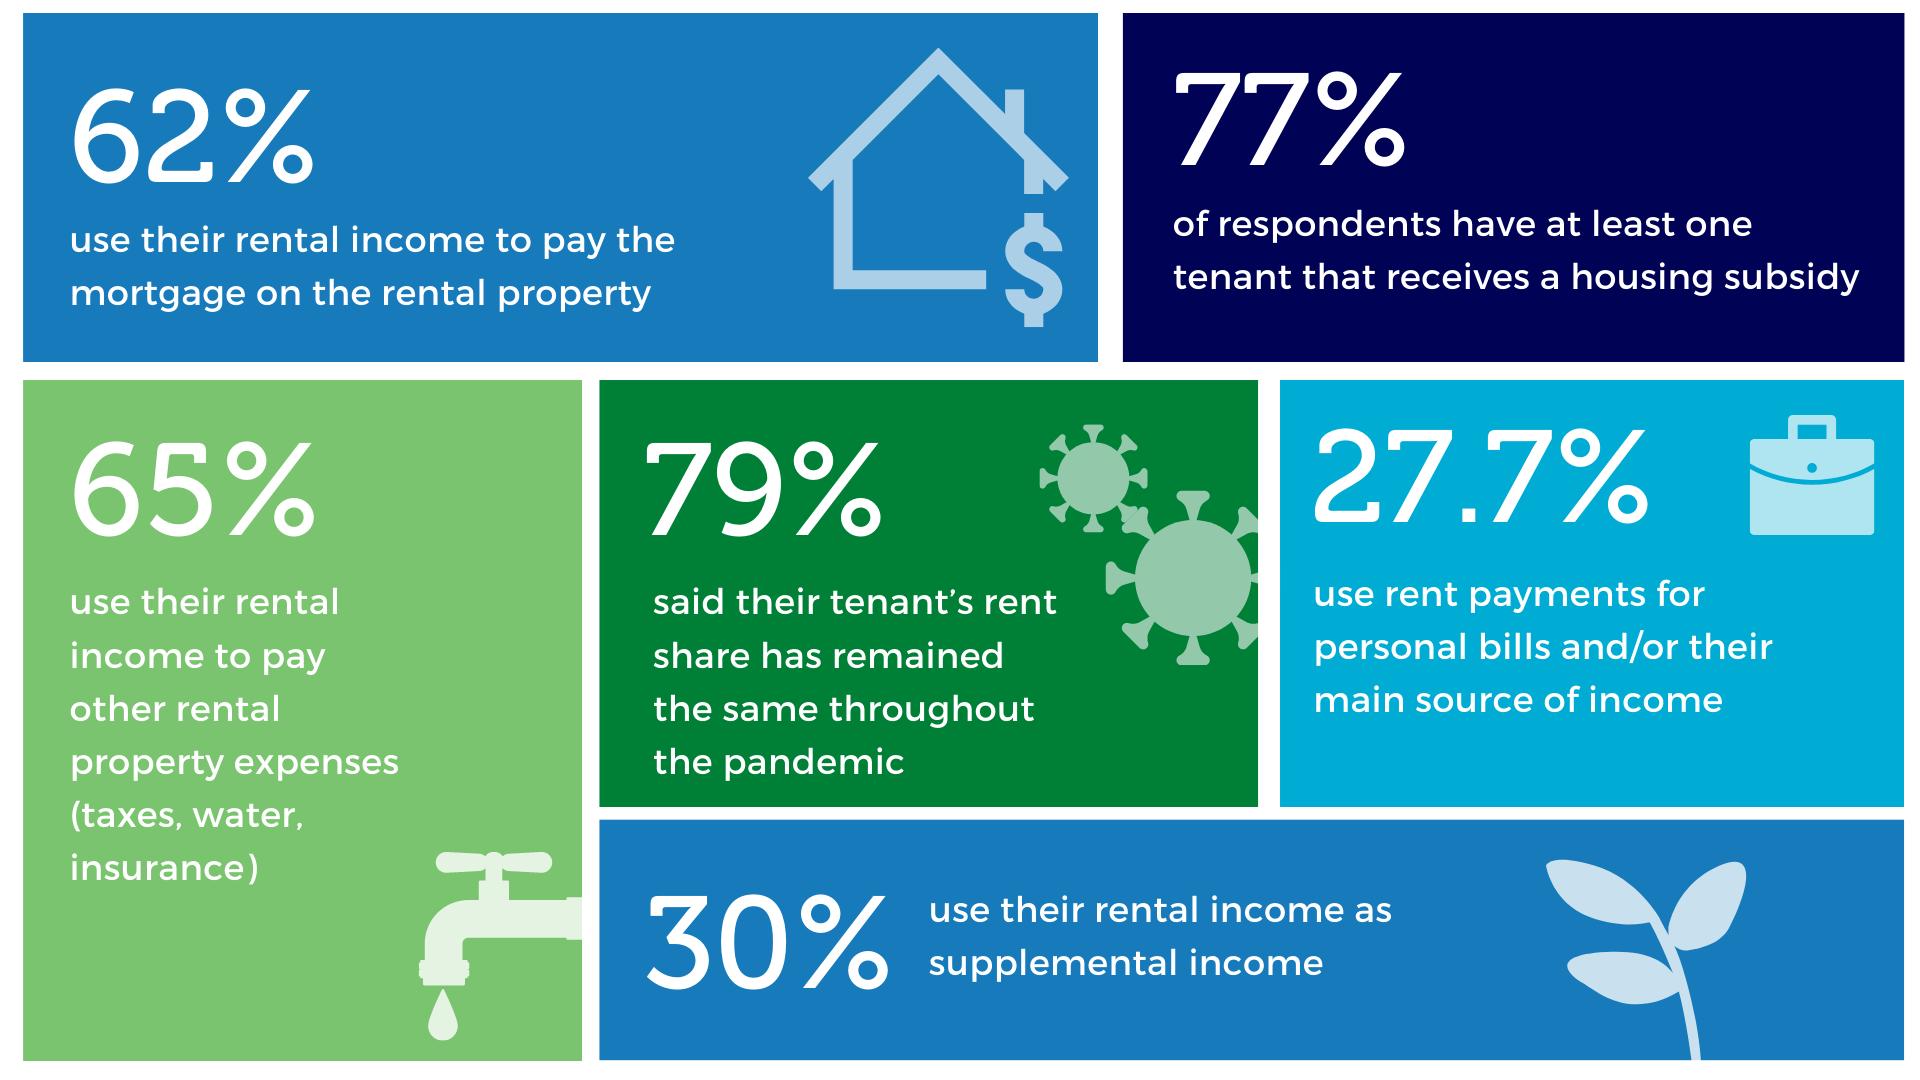 landlord survey results